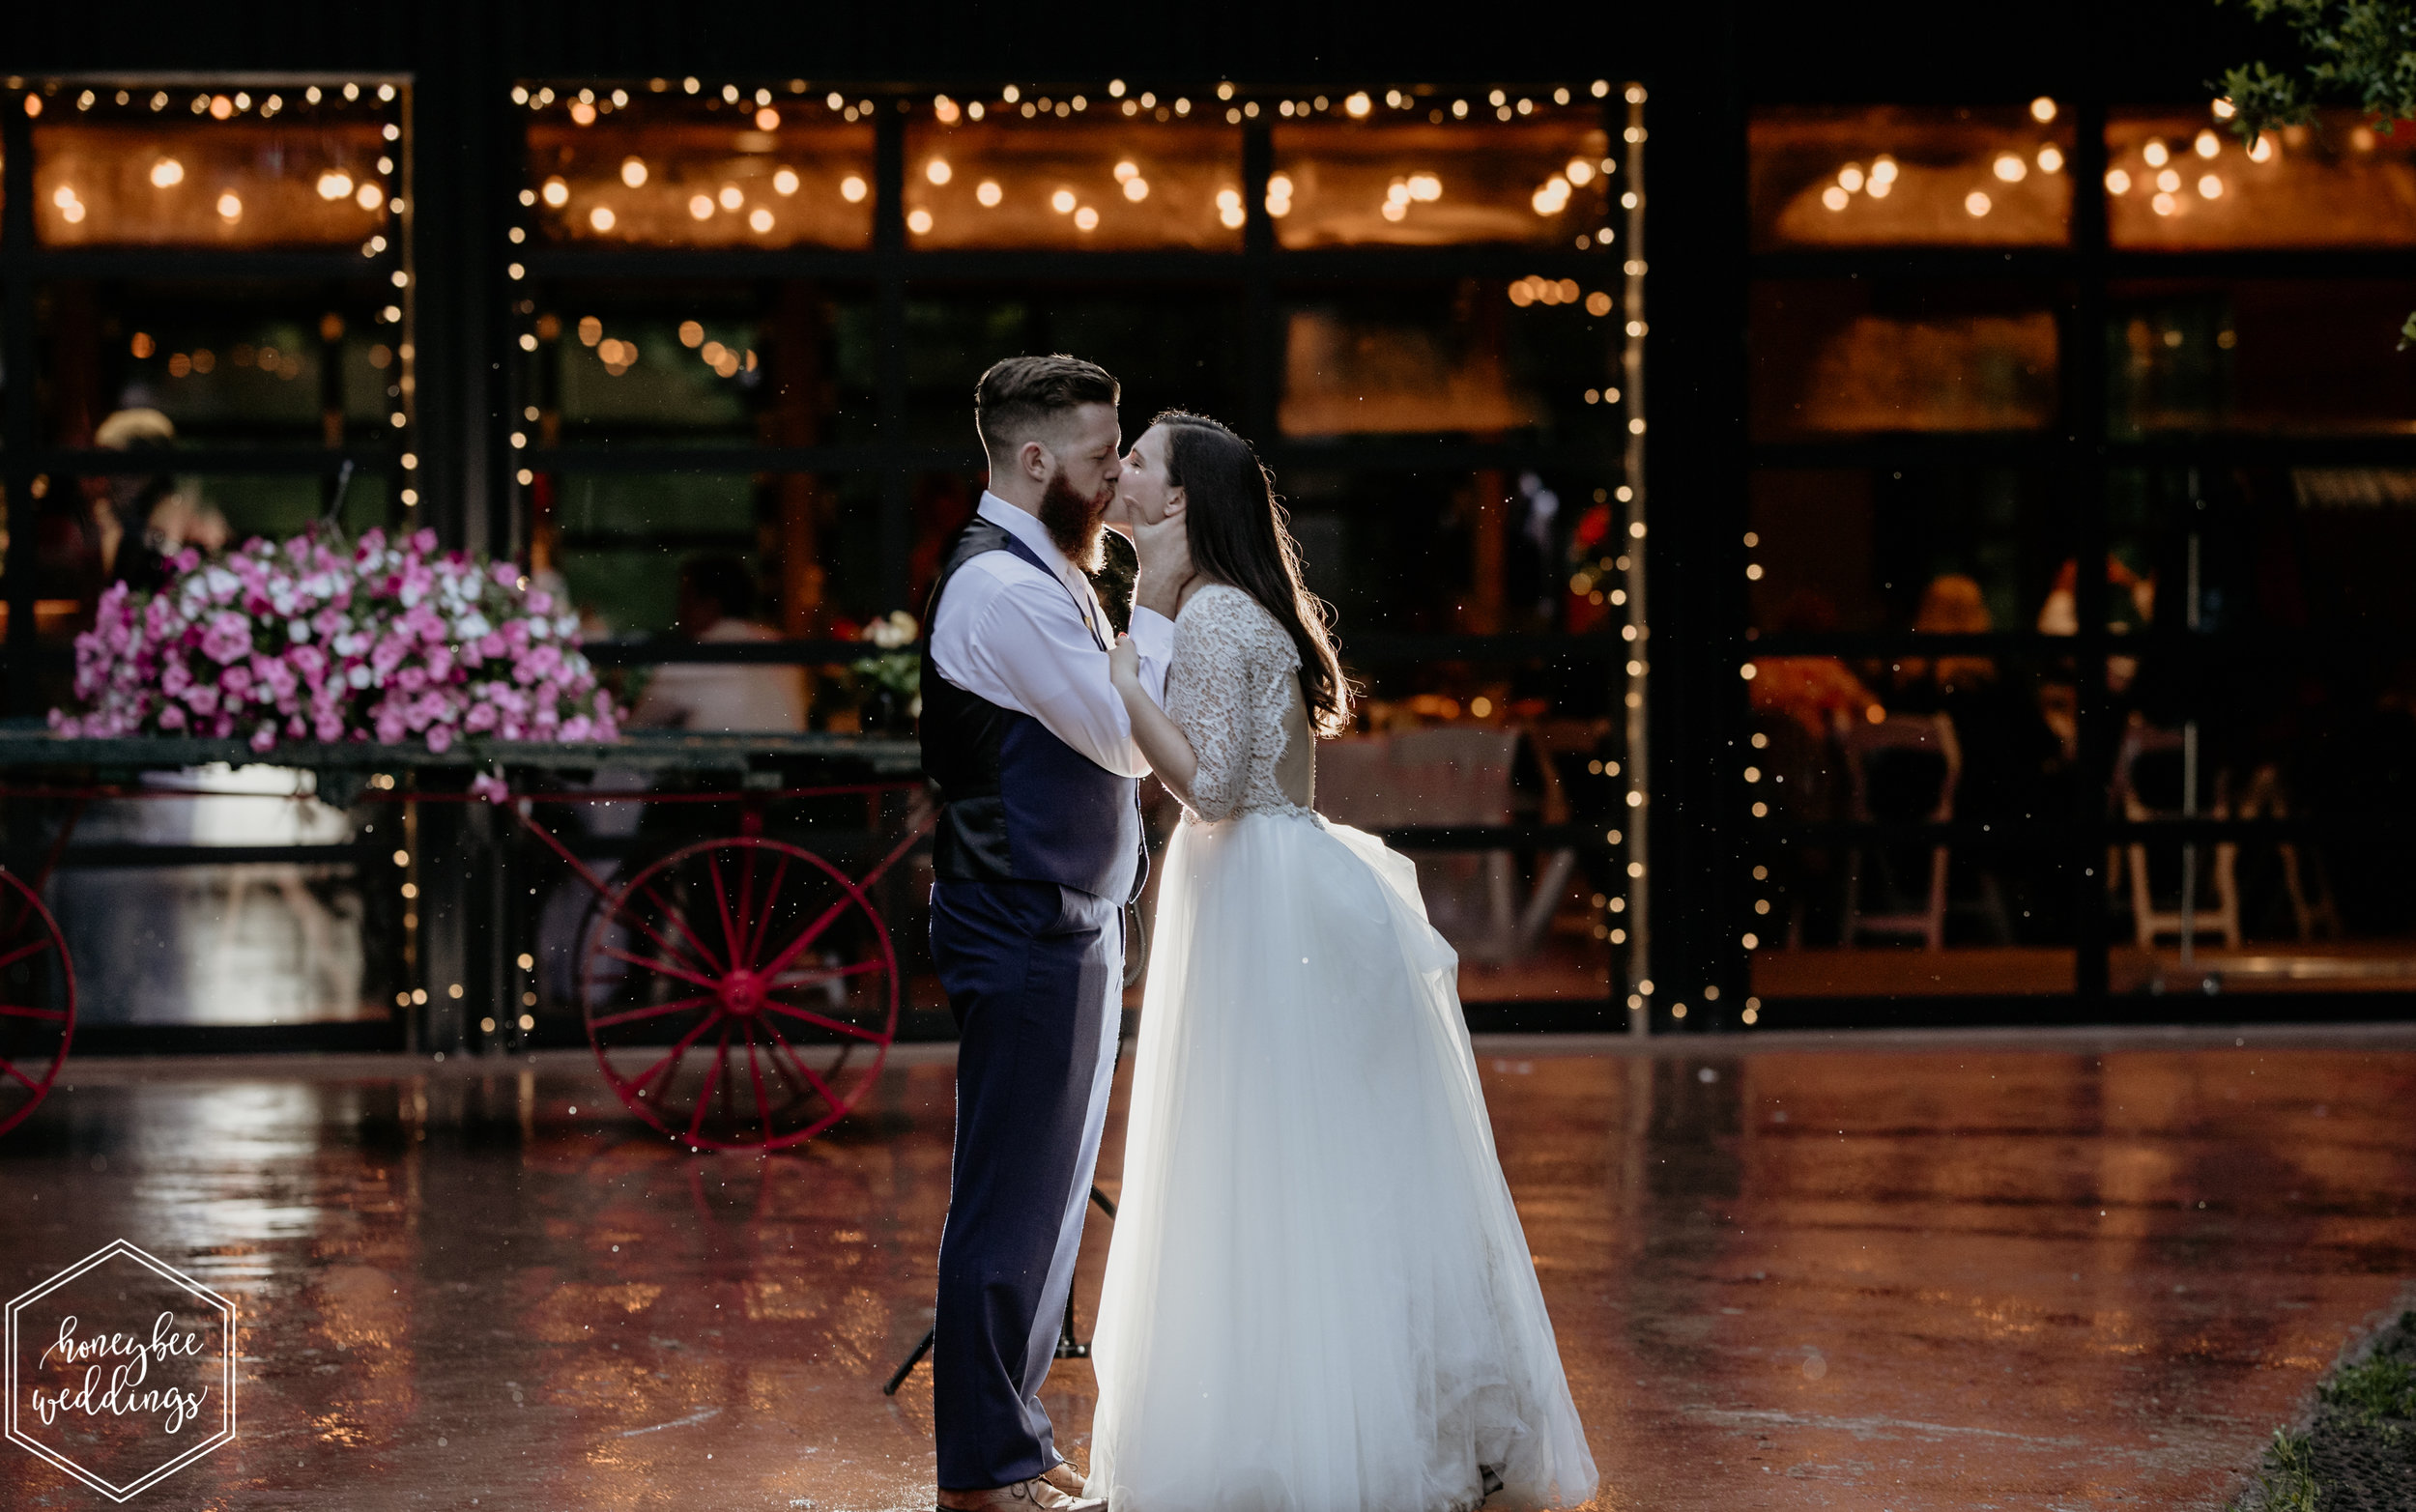 206Glacier National Park Wedding_Izaak Walton Inn Wedding_Honeybee Weddings_Norah & Kyle_June 08, 2019-2935.jpg